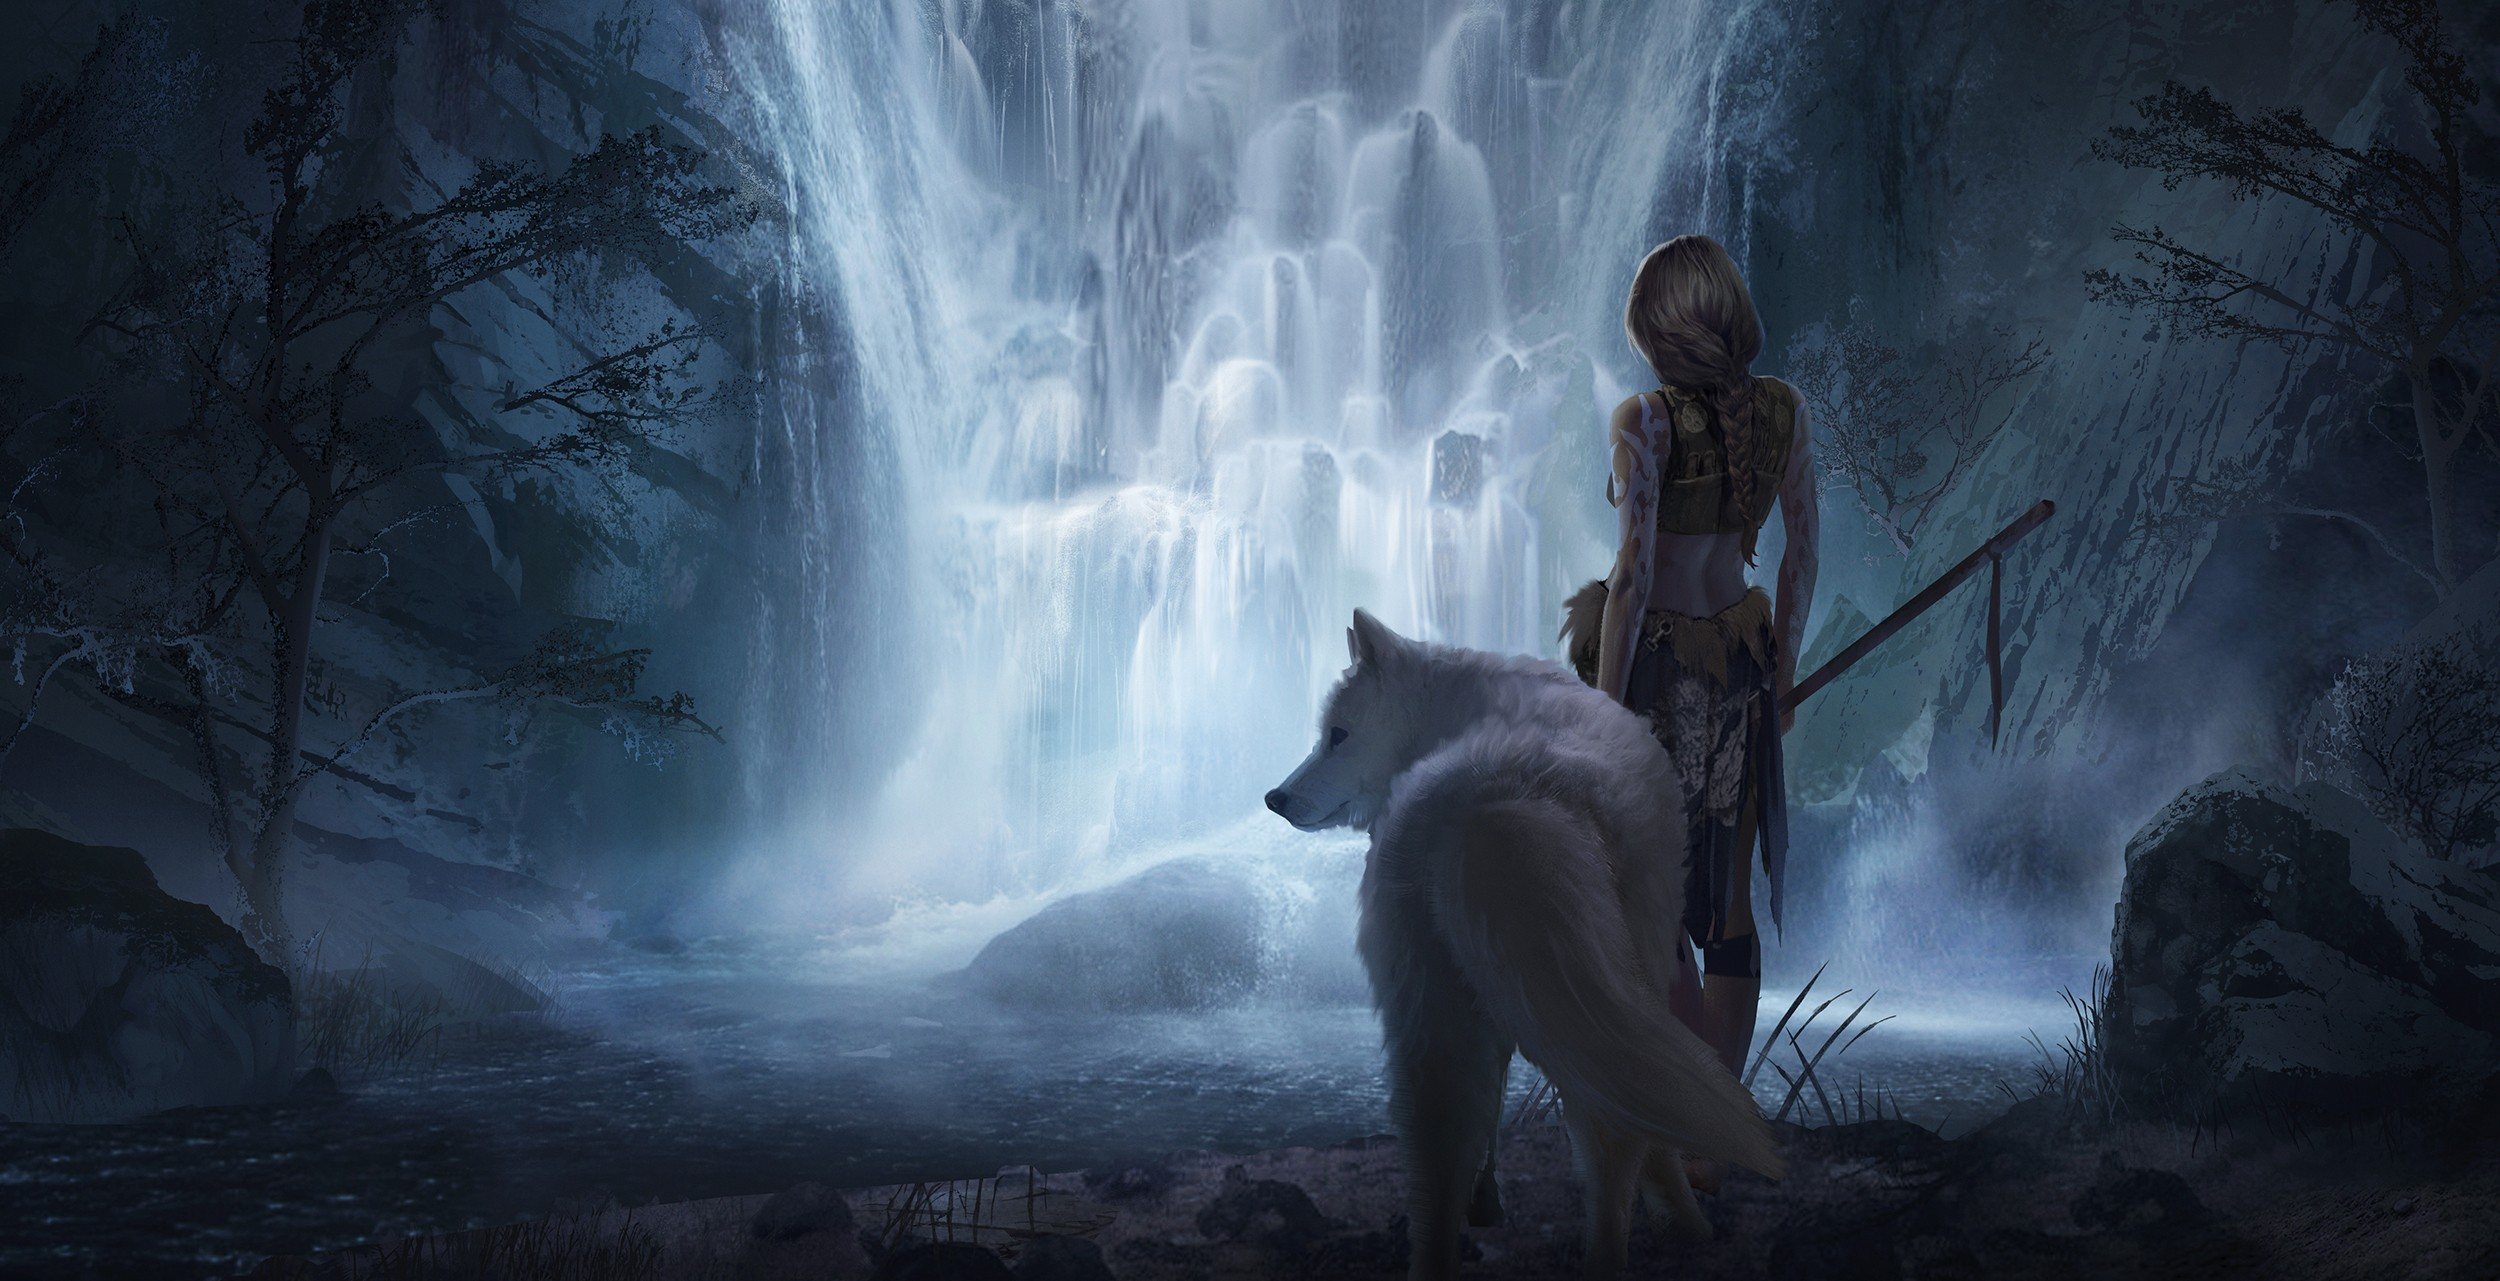 princess-mononoke-iphone-5-wallpaper - Awswallpapershd.com